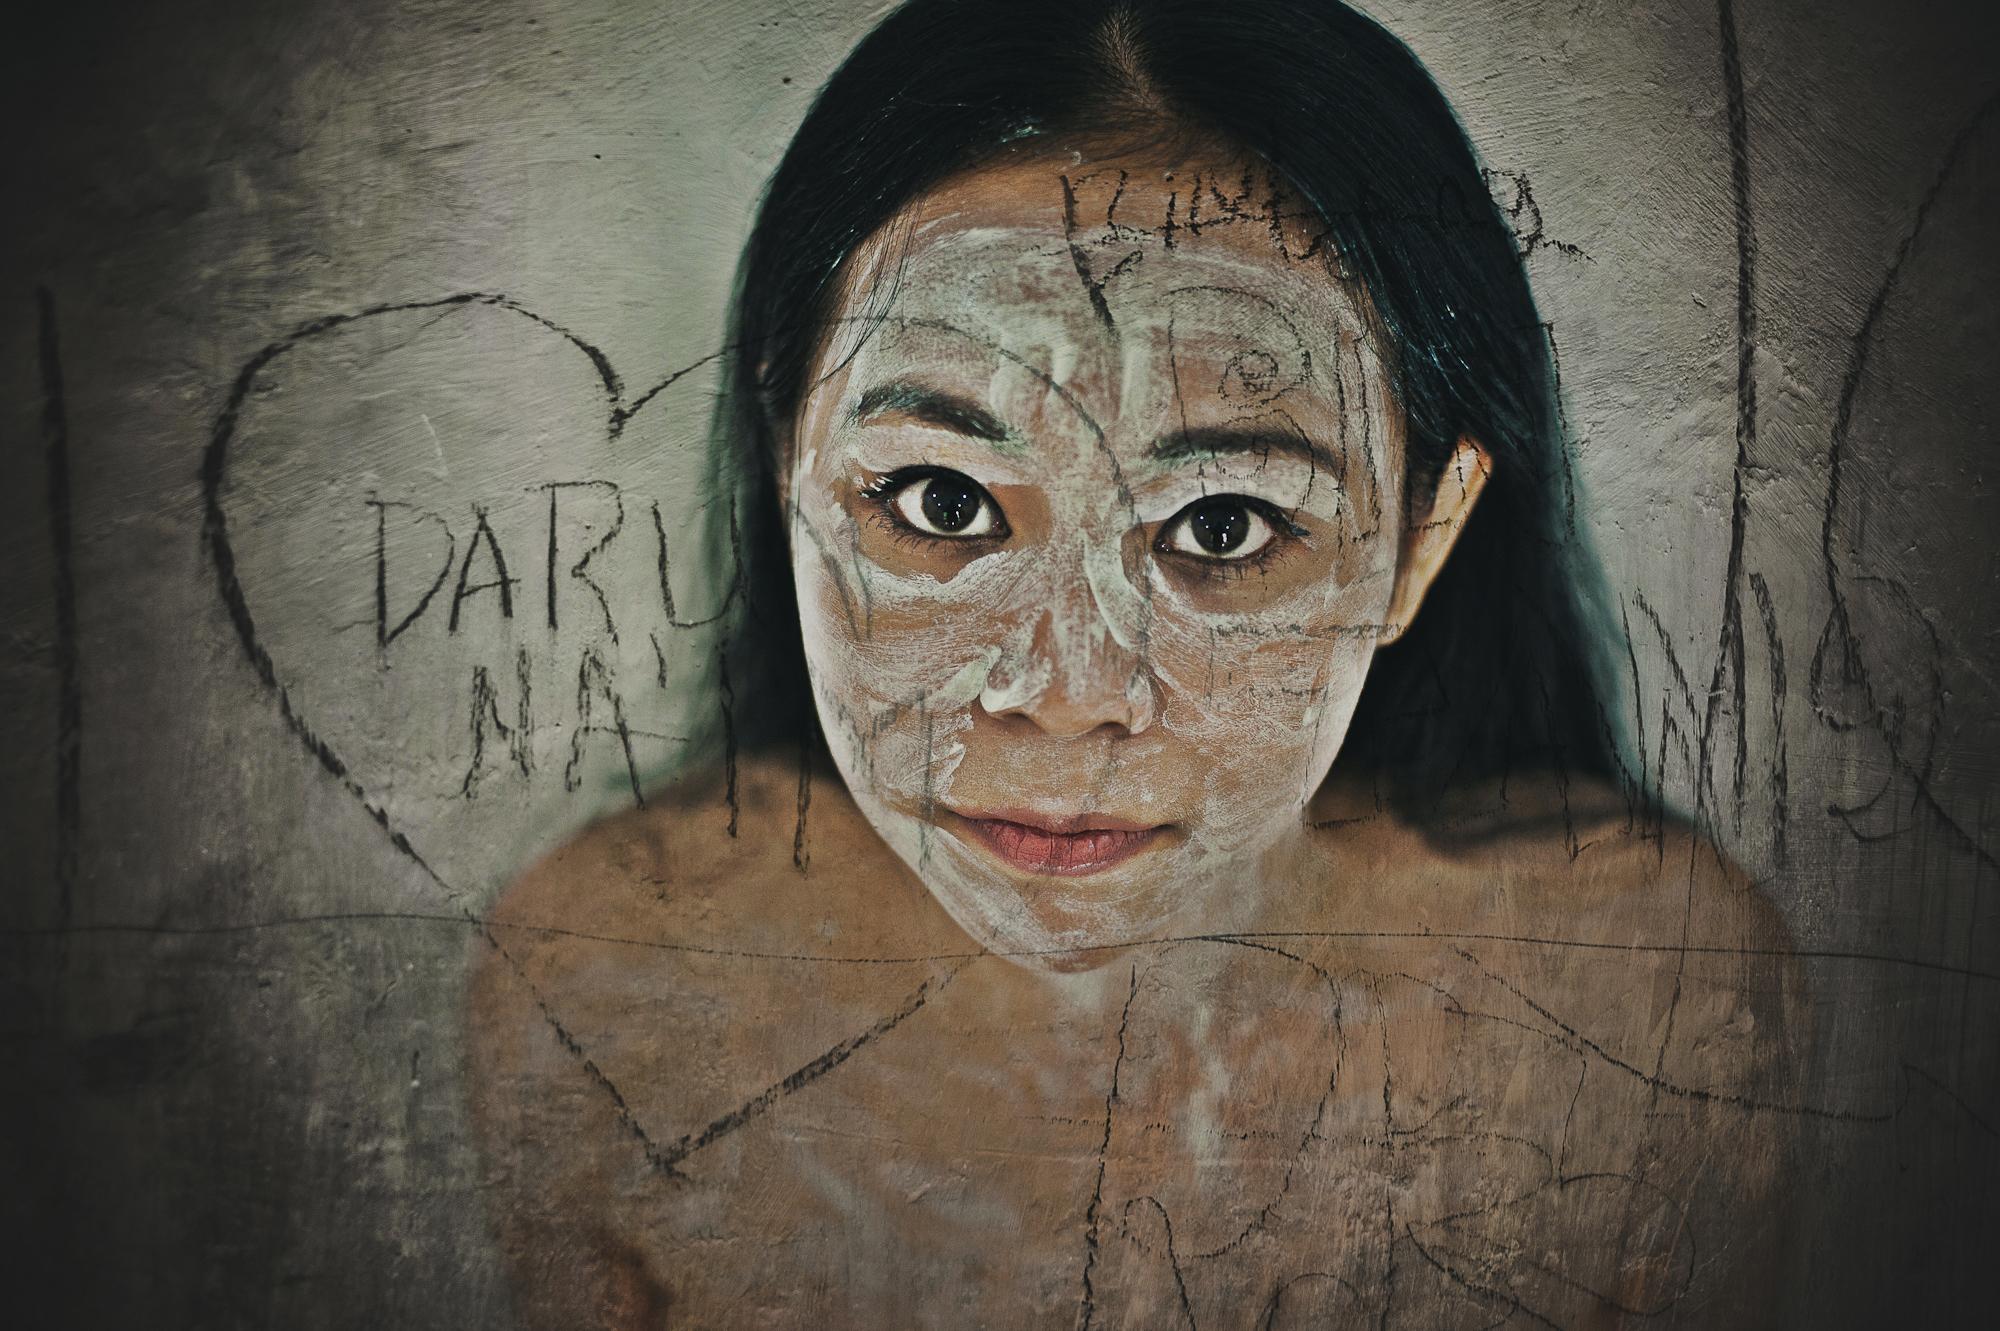 LADIES OF JAKARTA